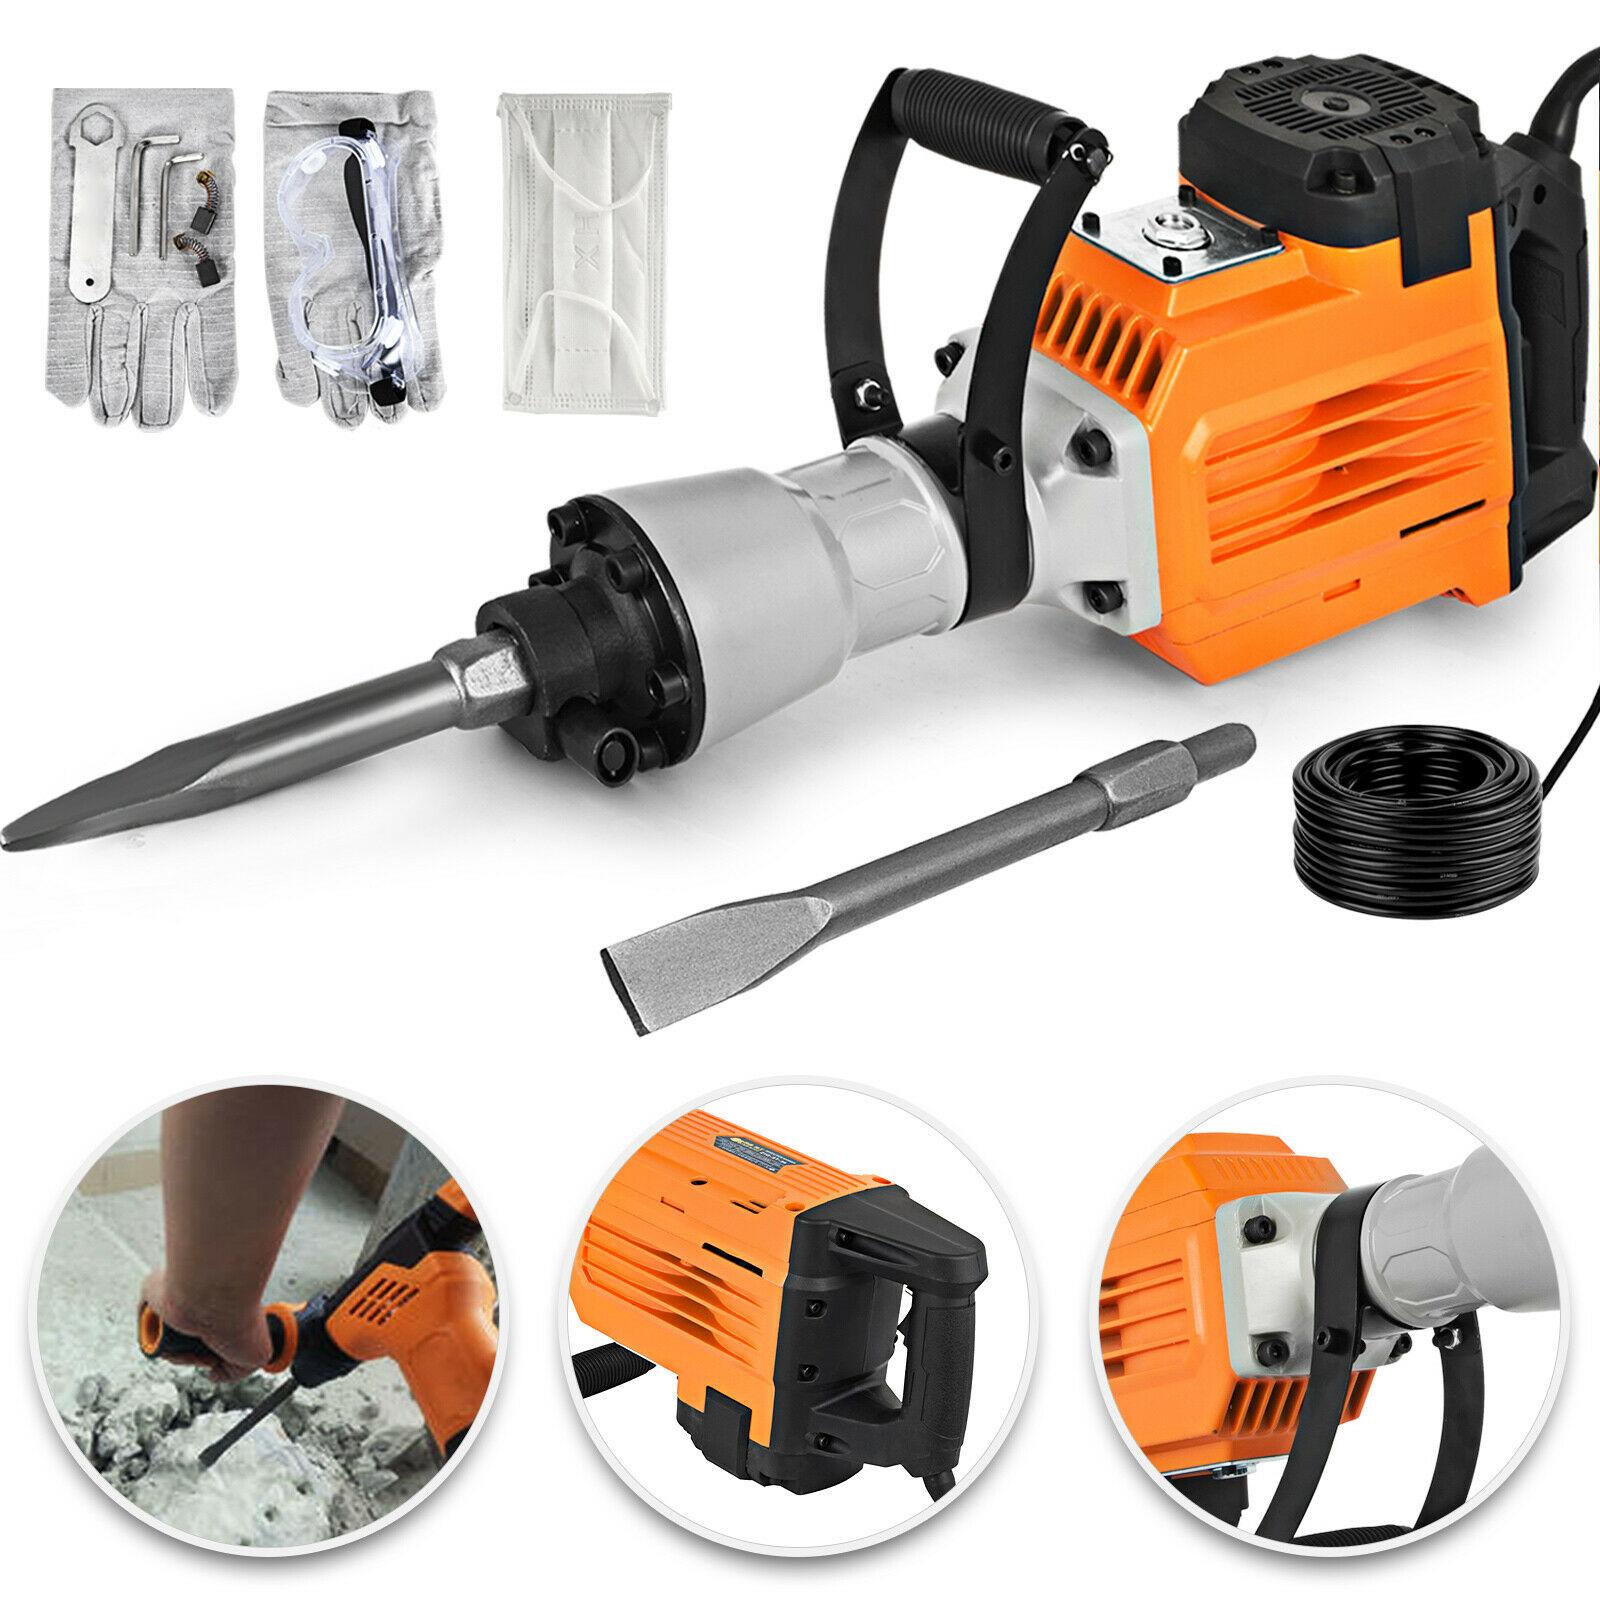 VEVOR 3600W Electric Demolition Hammer Heavy Duty Concrete Breaker 1800 RPM Chipping Jack Hammer Drills with Chisels Jackhammer